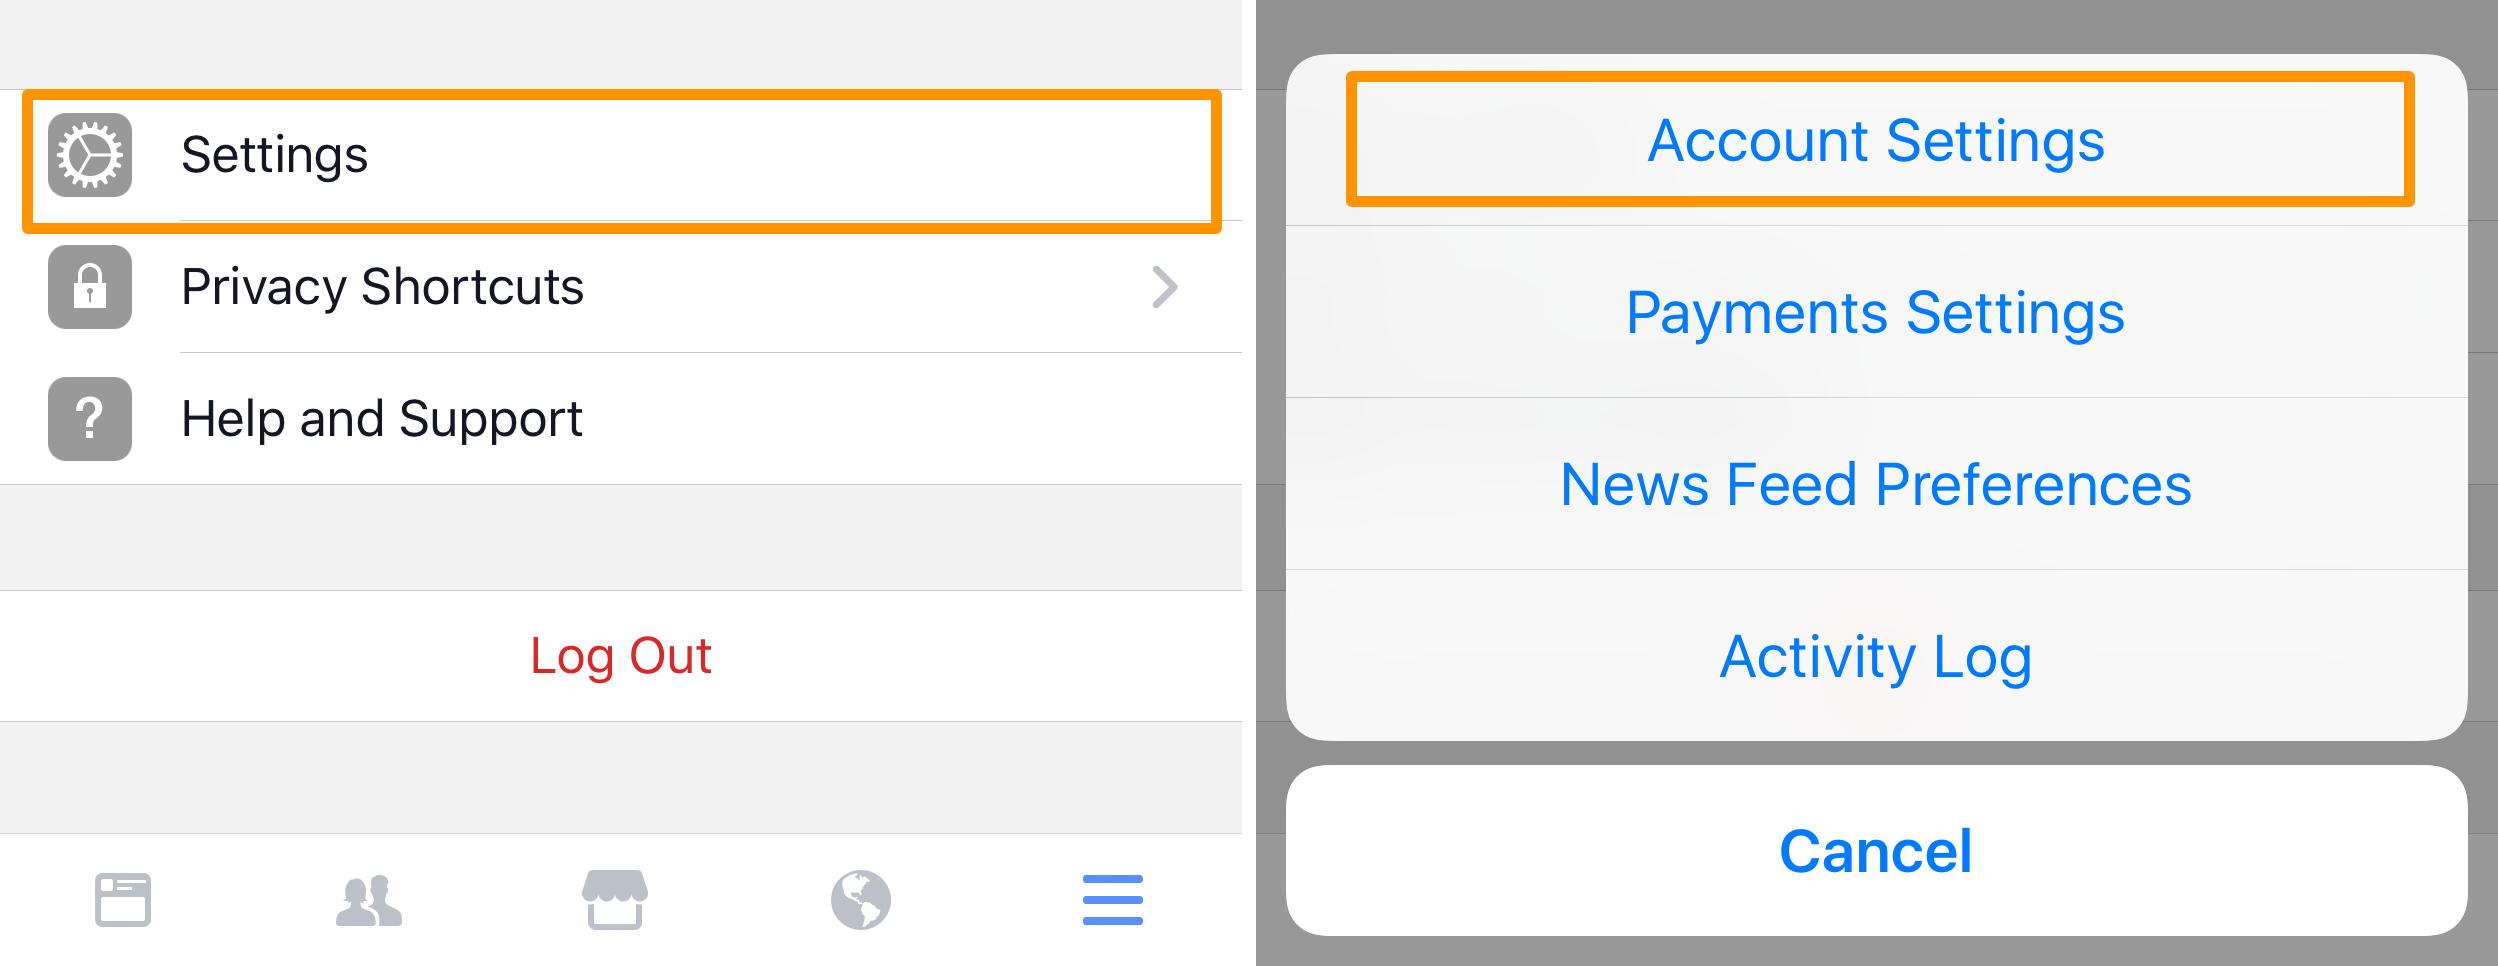 Facebook App Account Settings